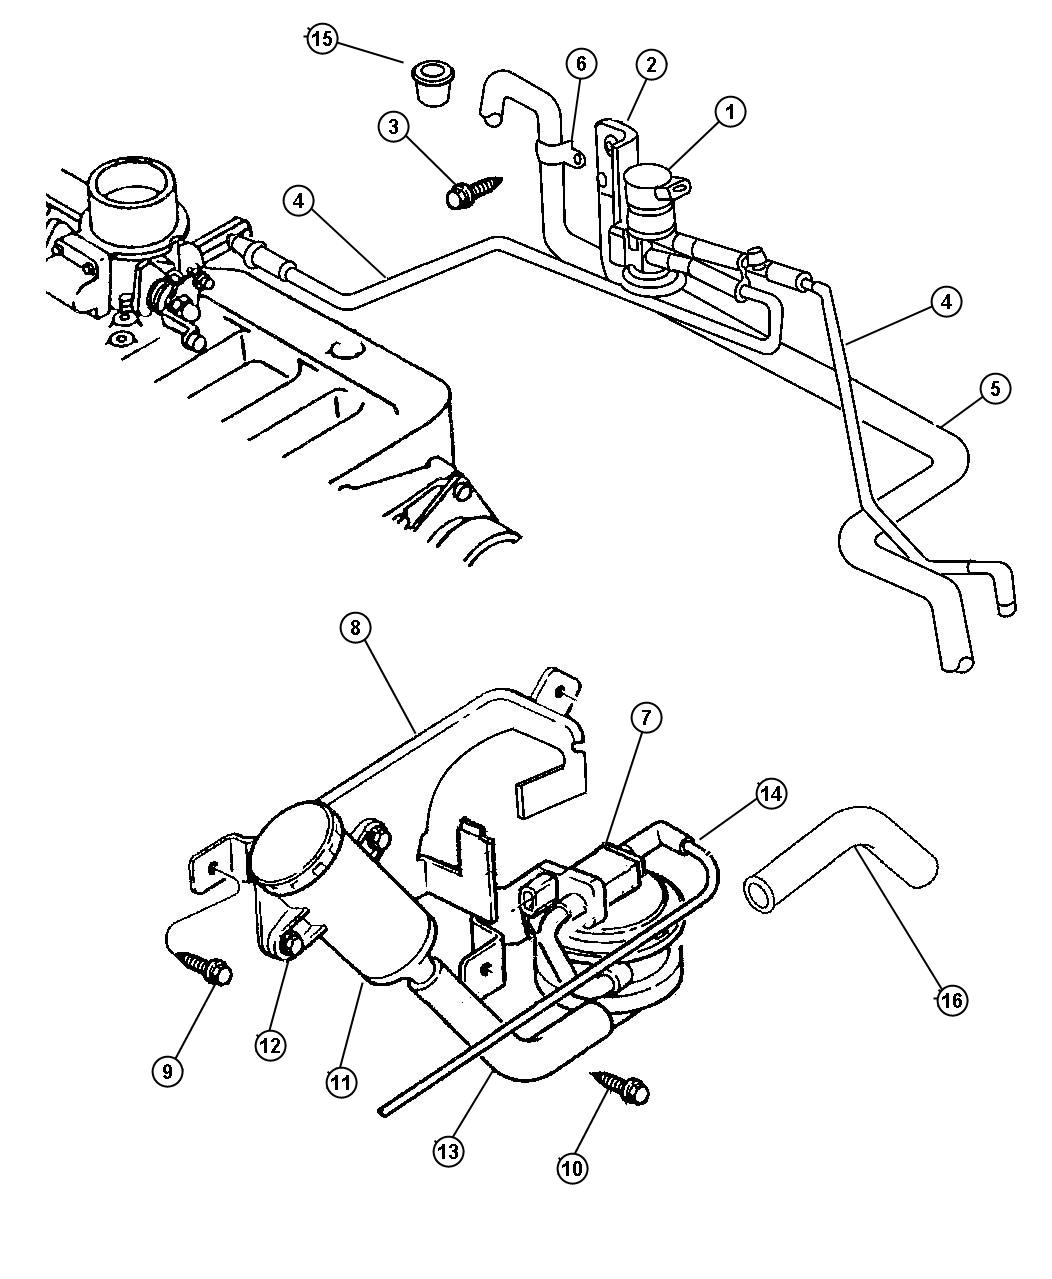 Jeep Grand Cherokee Screw. Tapping. 19-16x.375. 190-16x